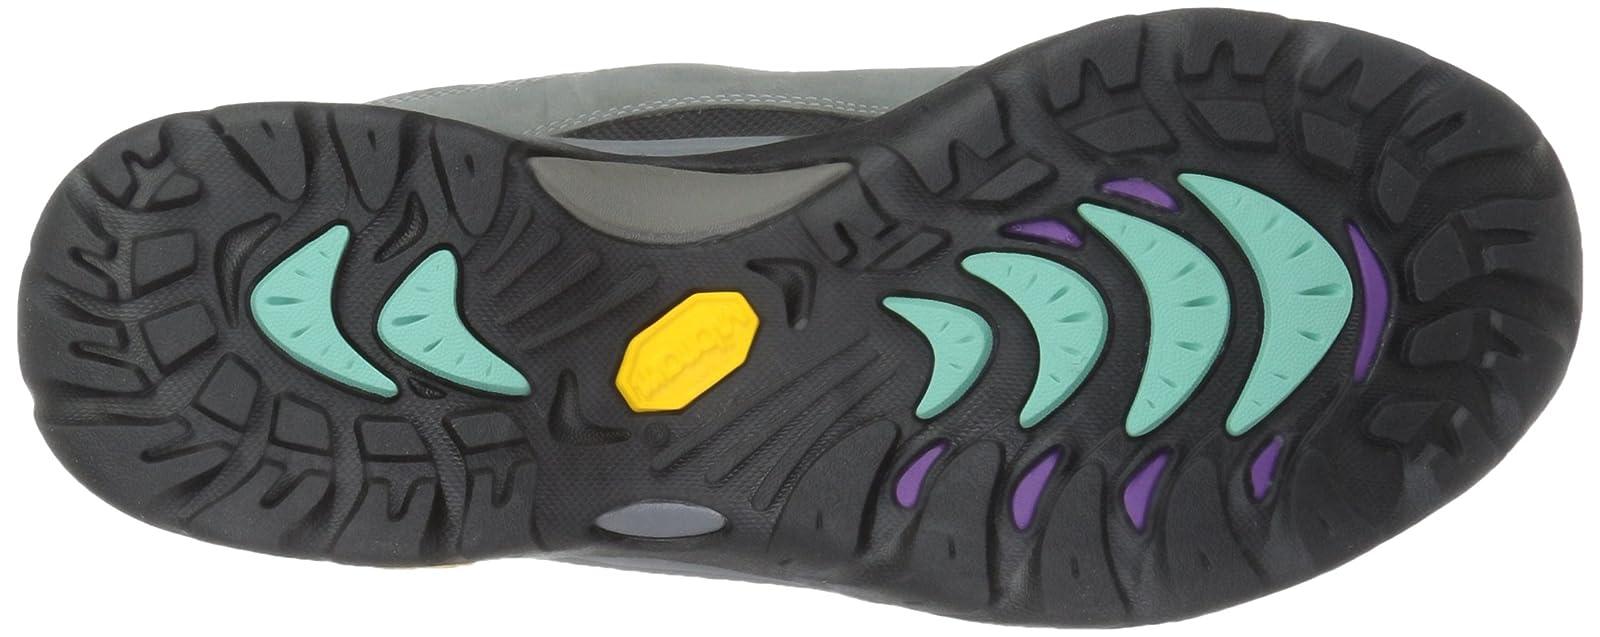 Ahnu Women's Montara II Hiking Shoe Black 6 B(M) US - 3